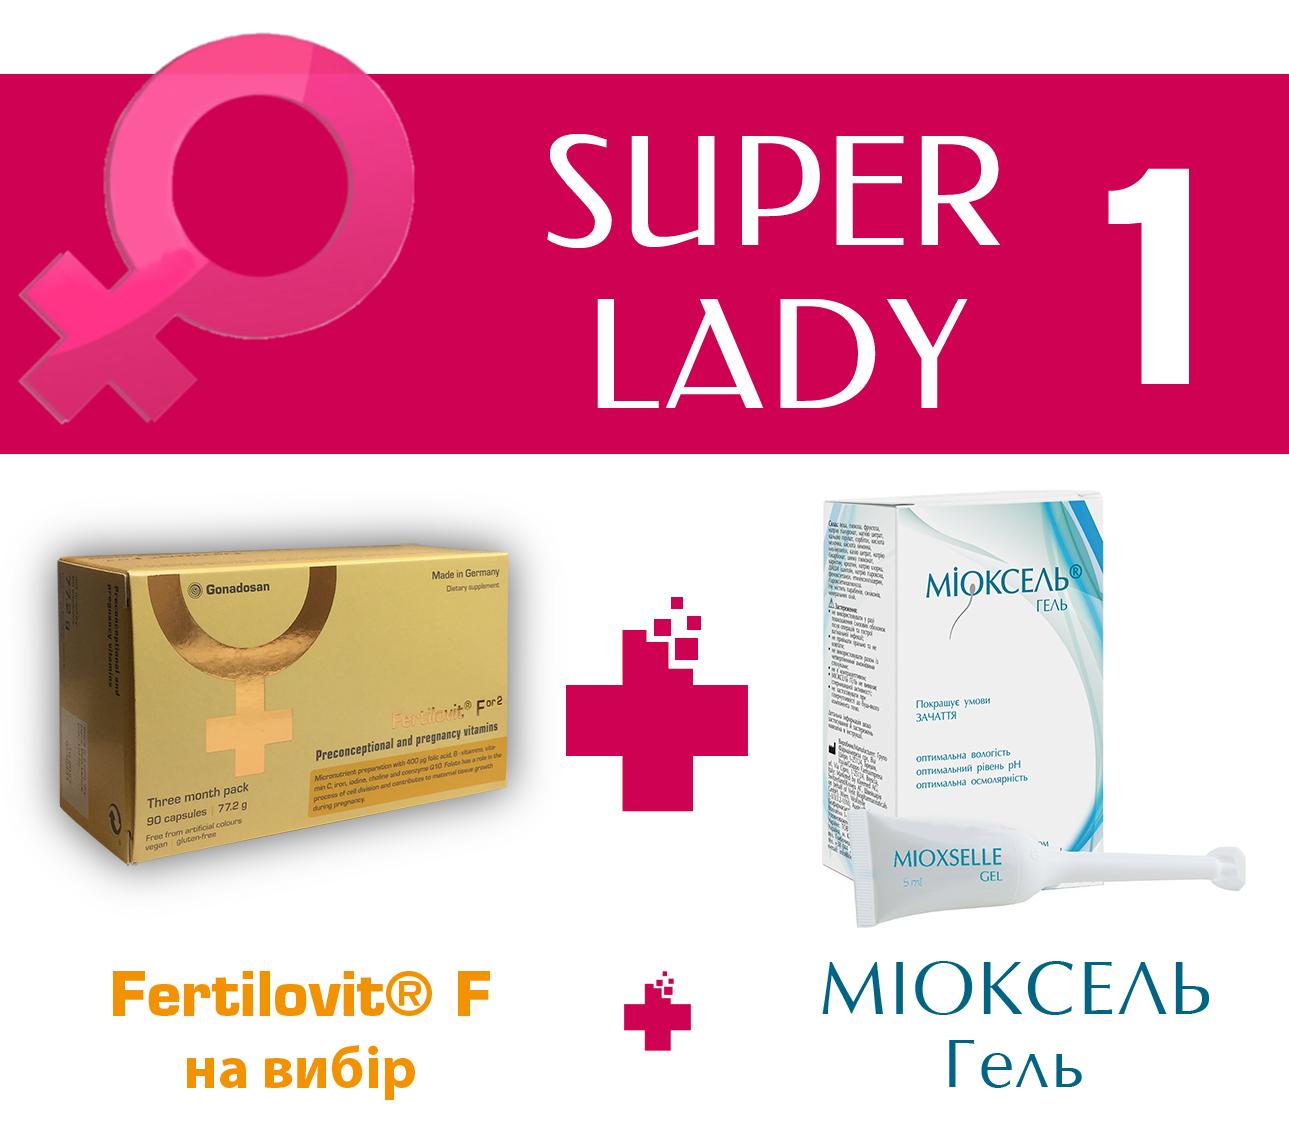 site_super_lady1_3